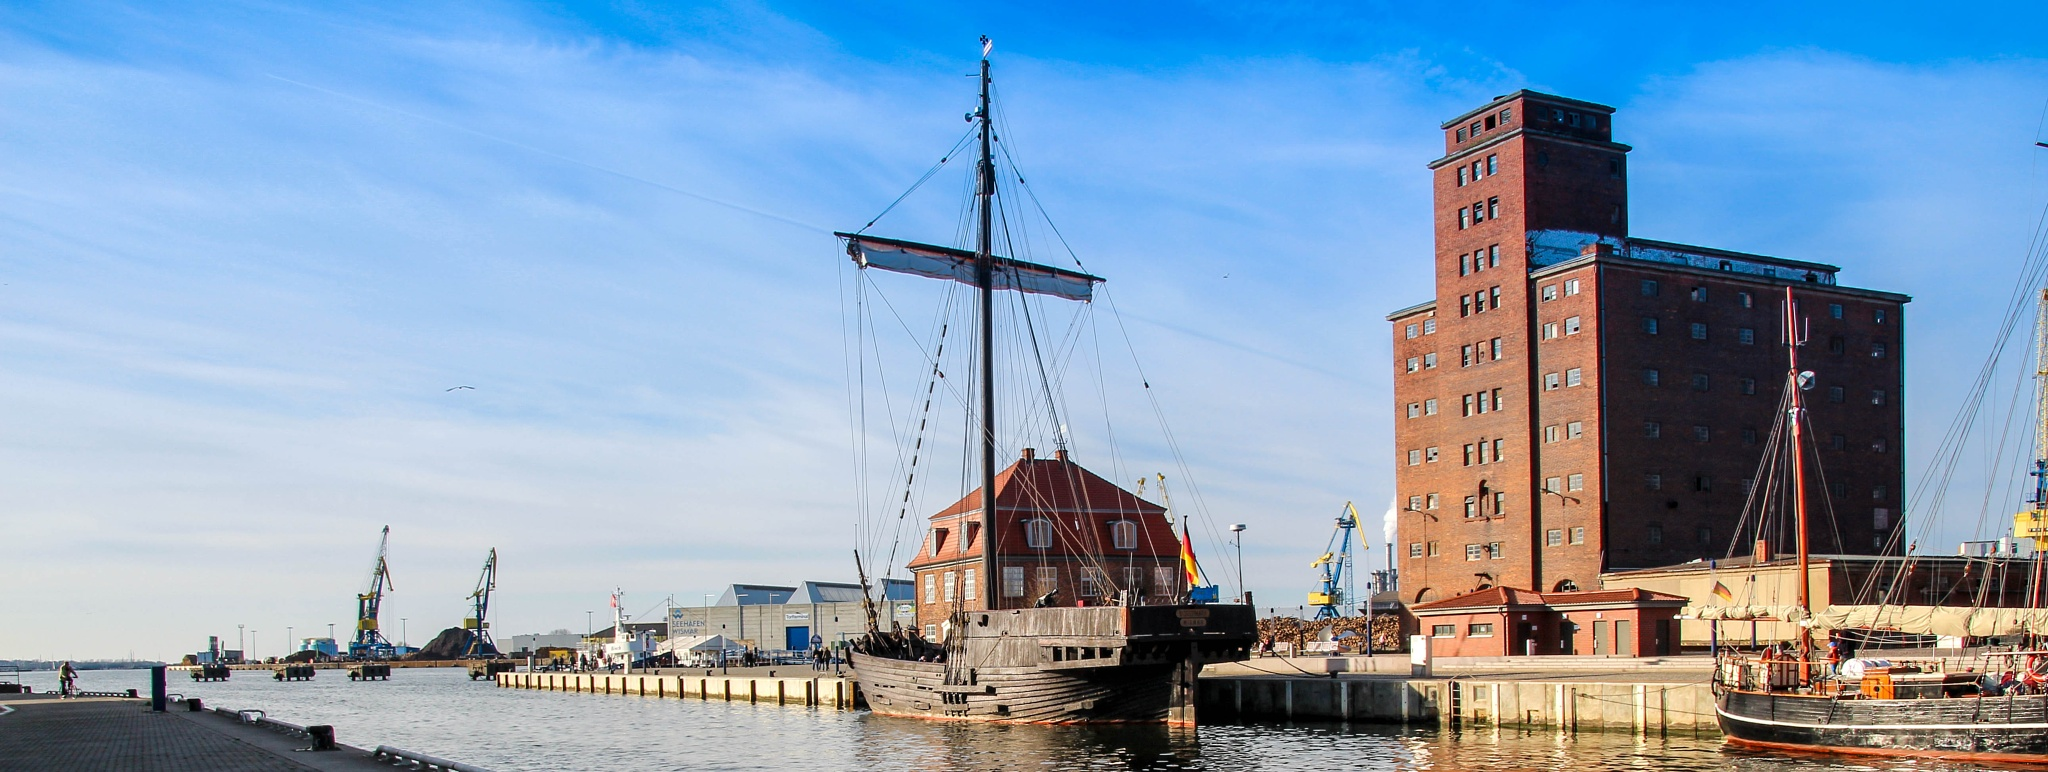 port of Wismar by Dine1980